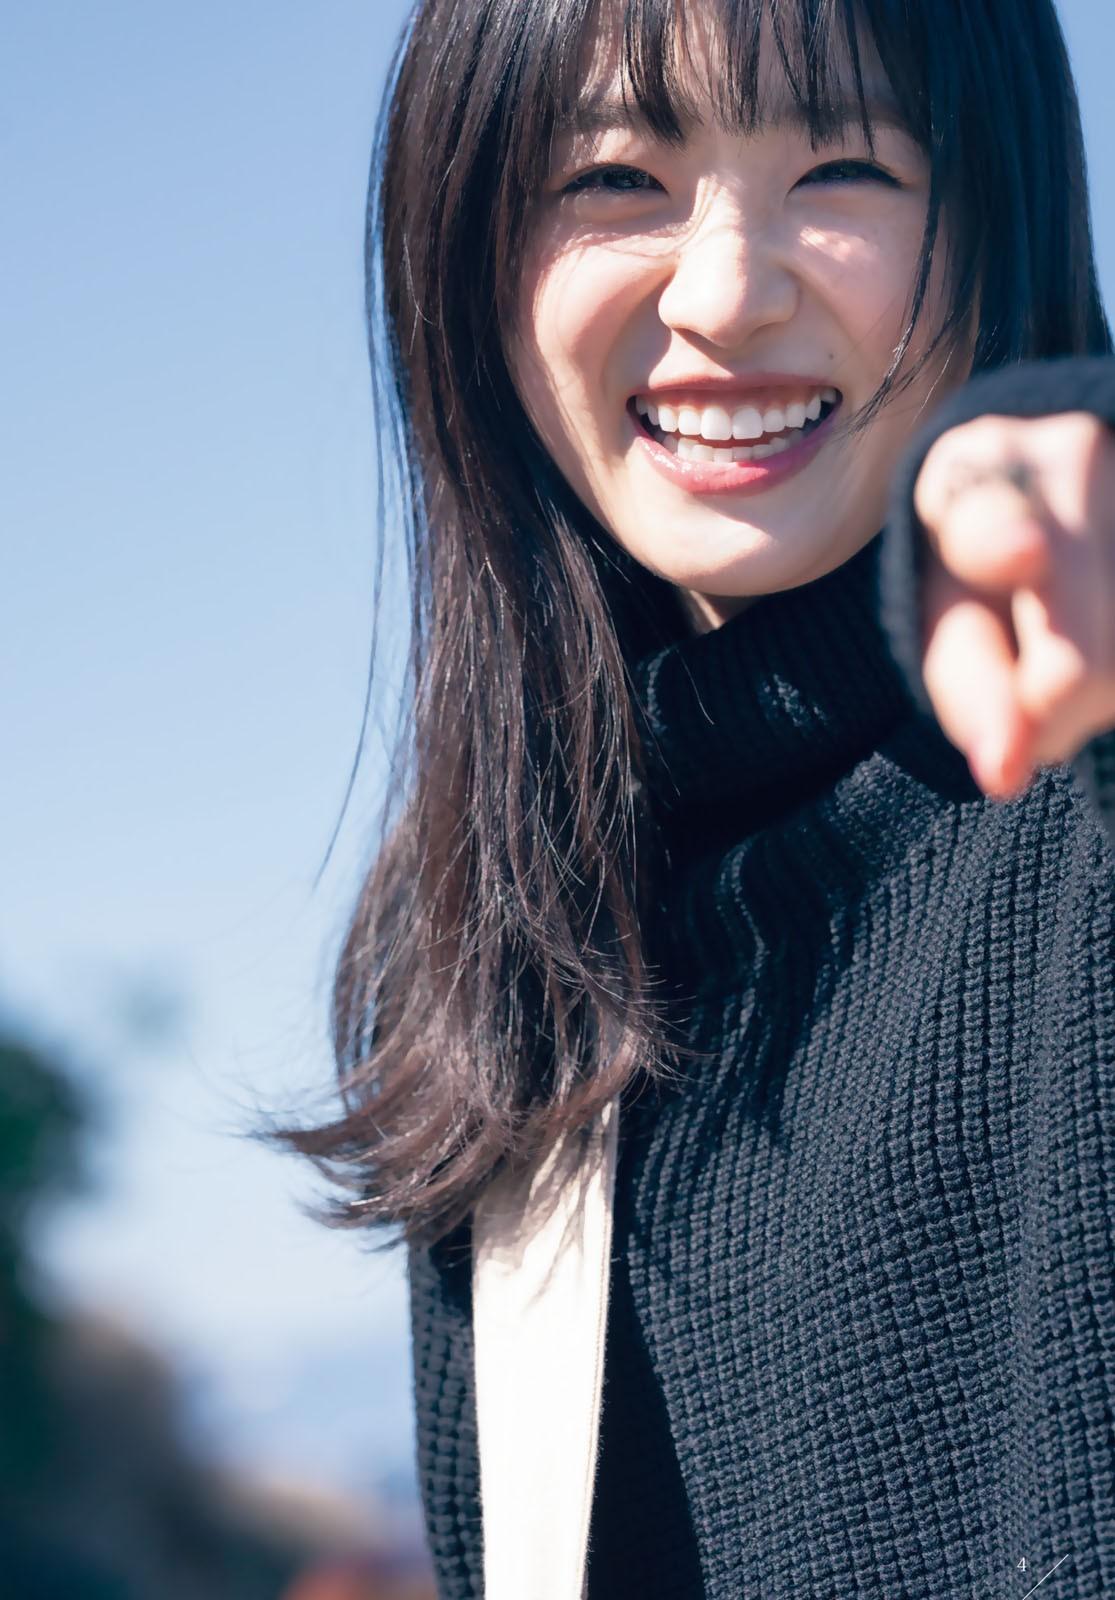 image http://scanlover.com/assets/images/2170-XIH2Fxin1mvxThCh.jpeg